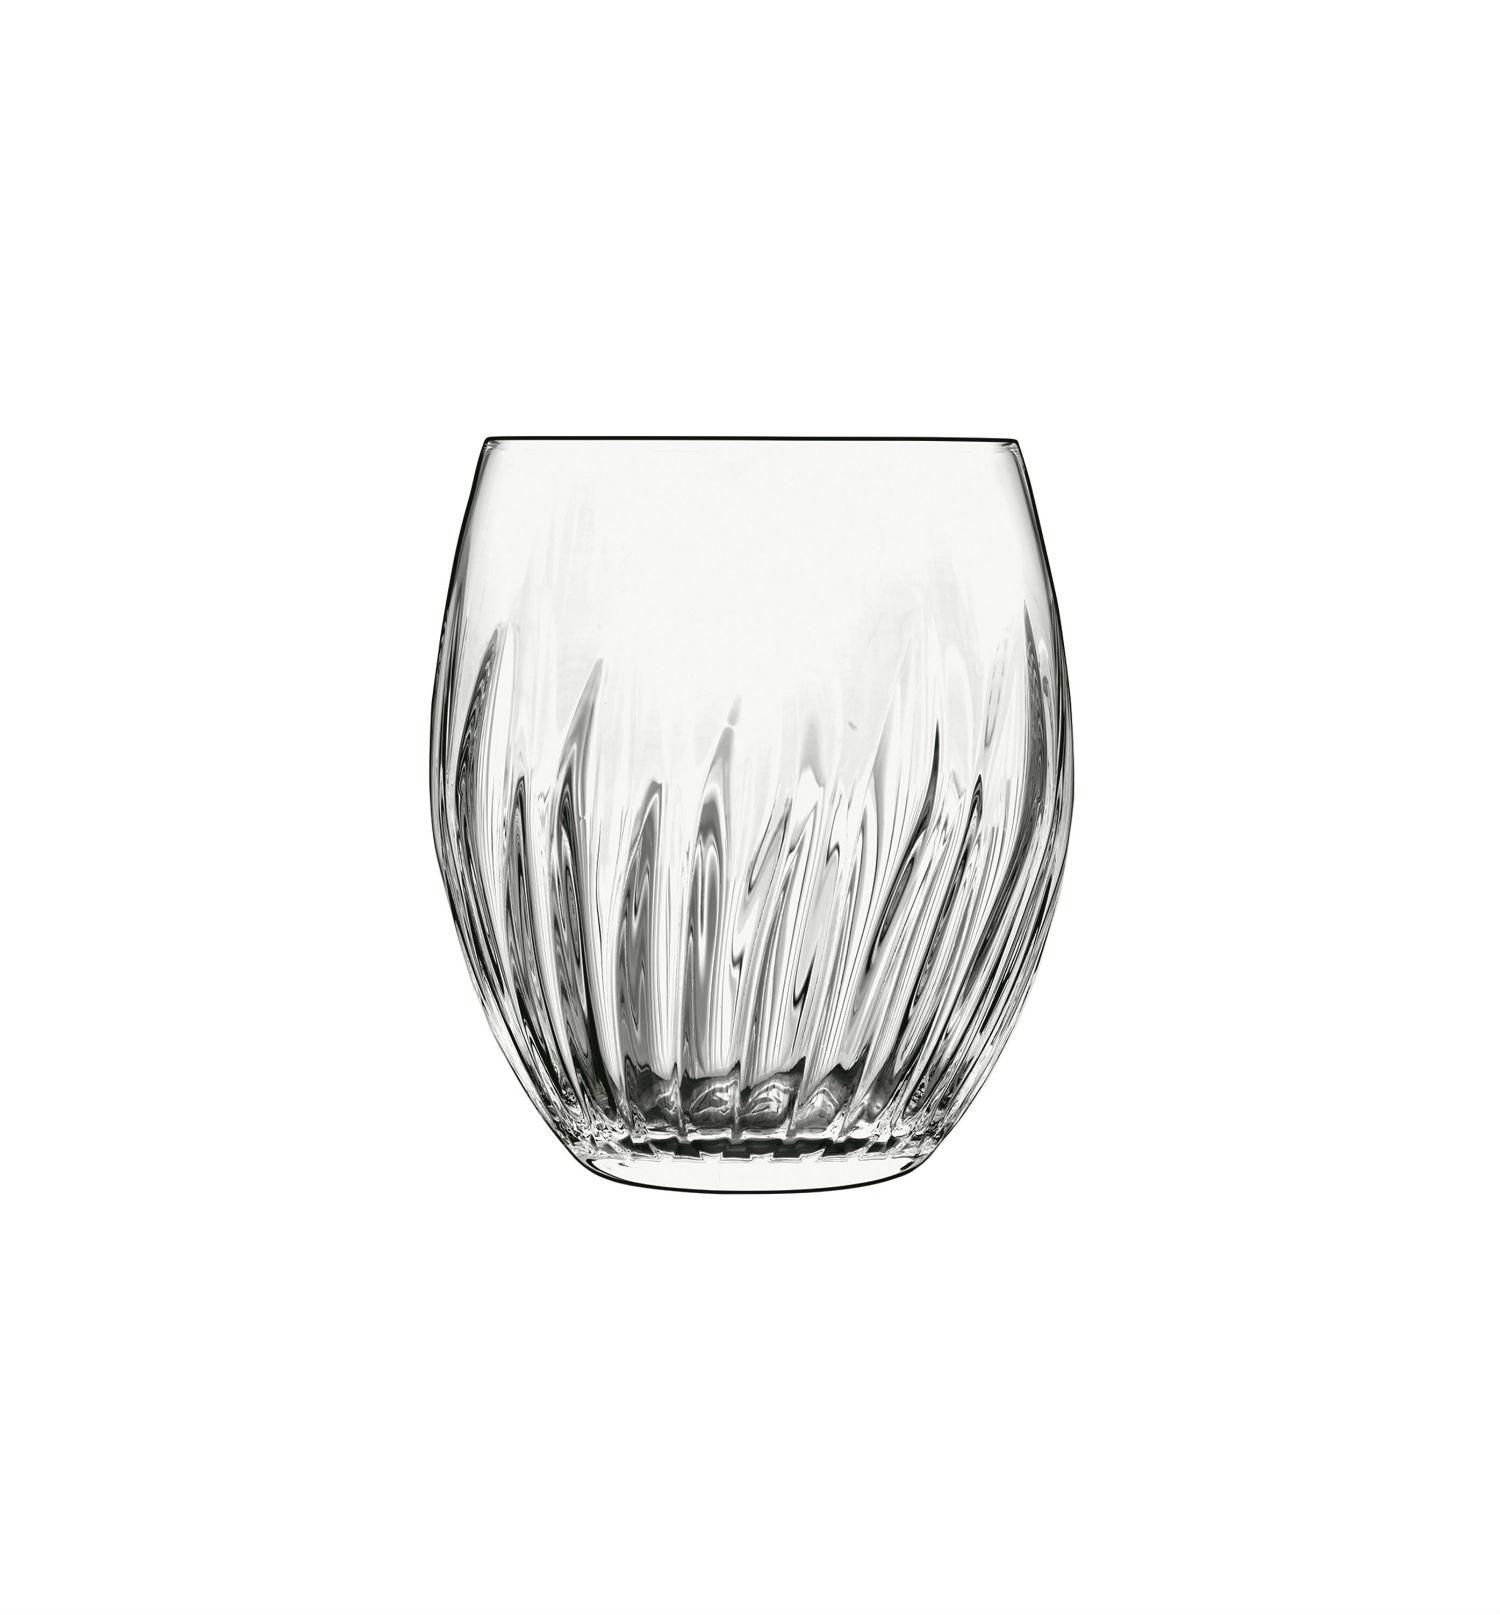 Luigi Bormioli Mixology vand/whiskyglas, 500 ml